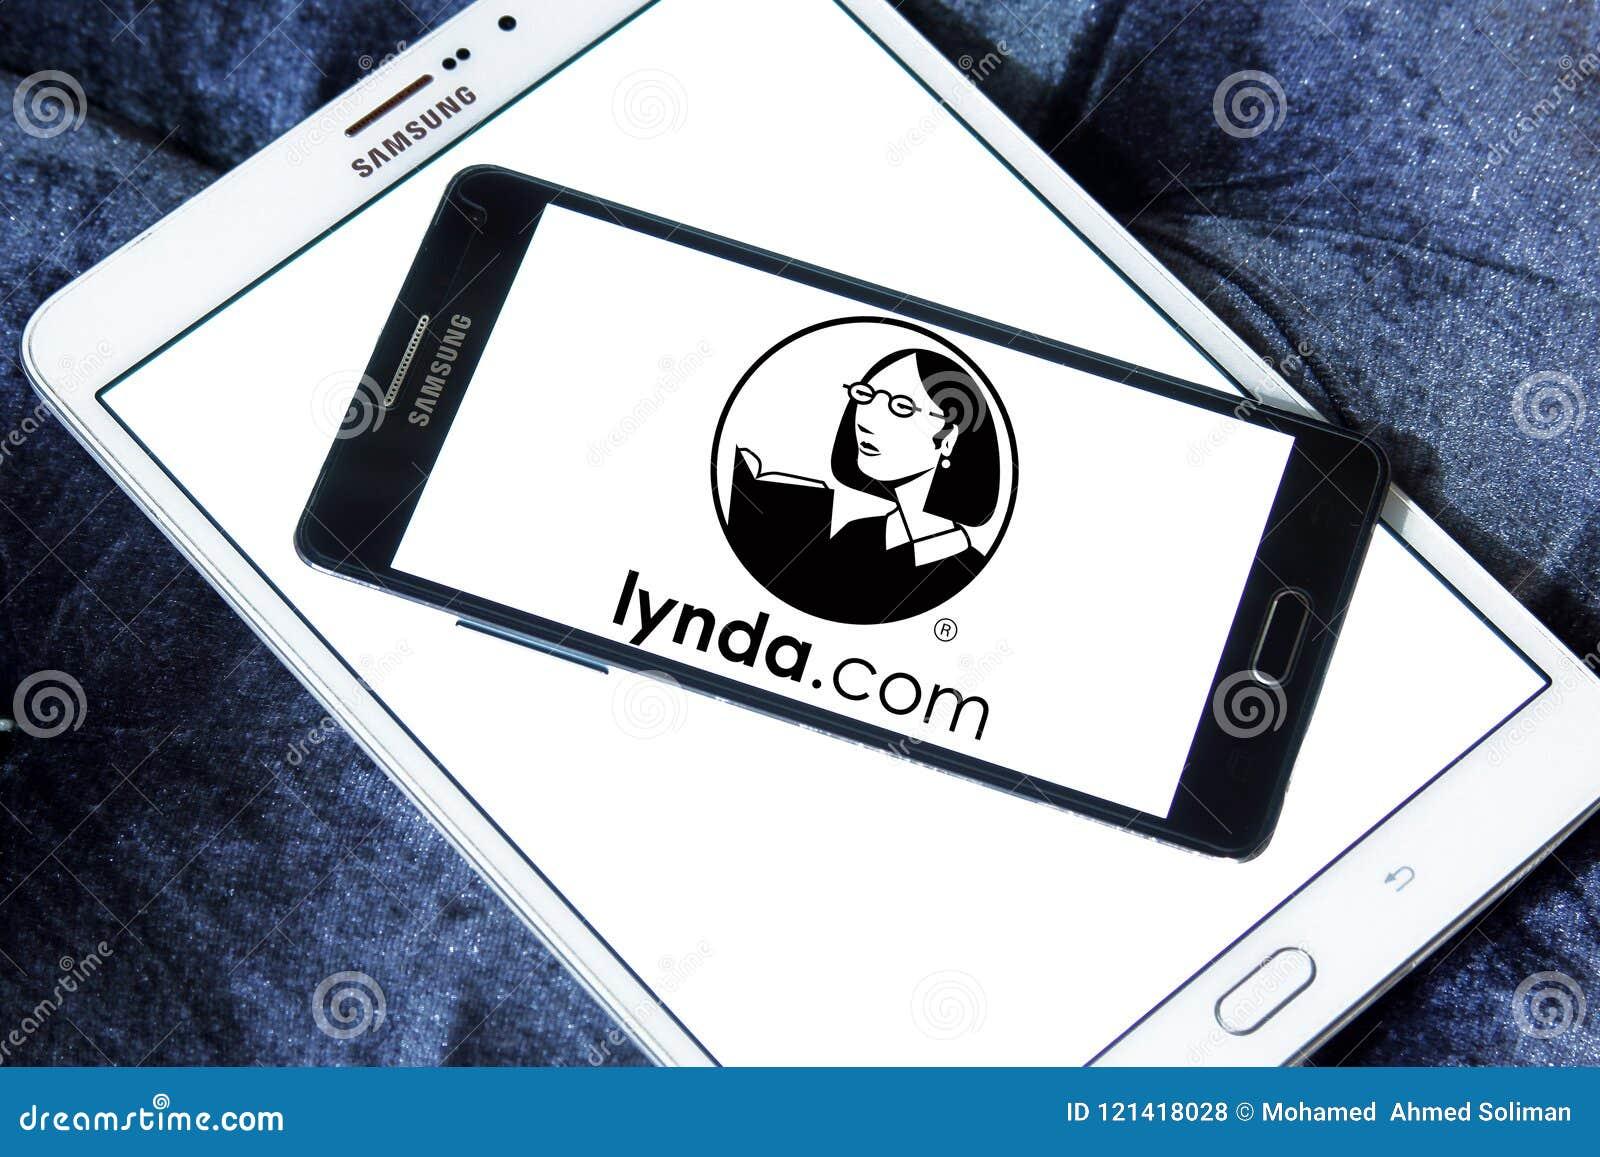 Lynda com logo editorial stock photo  Image of illustration